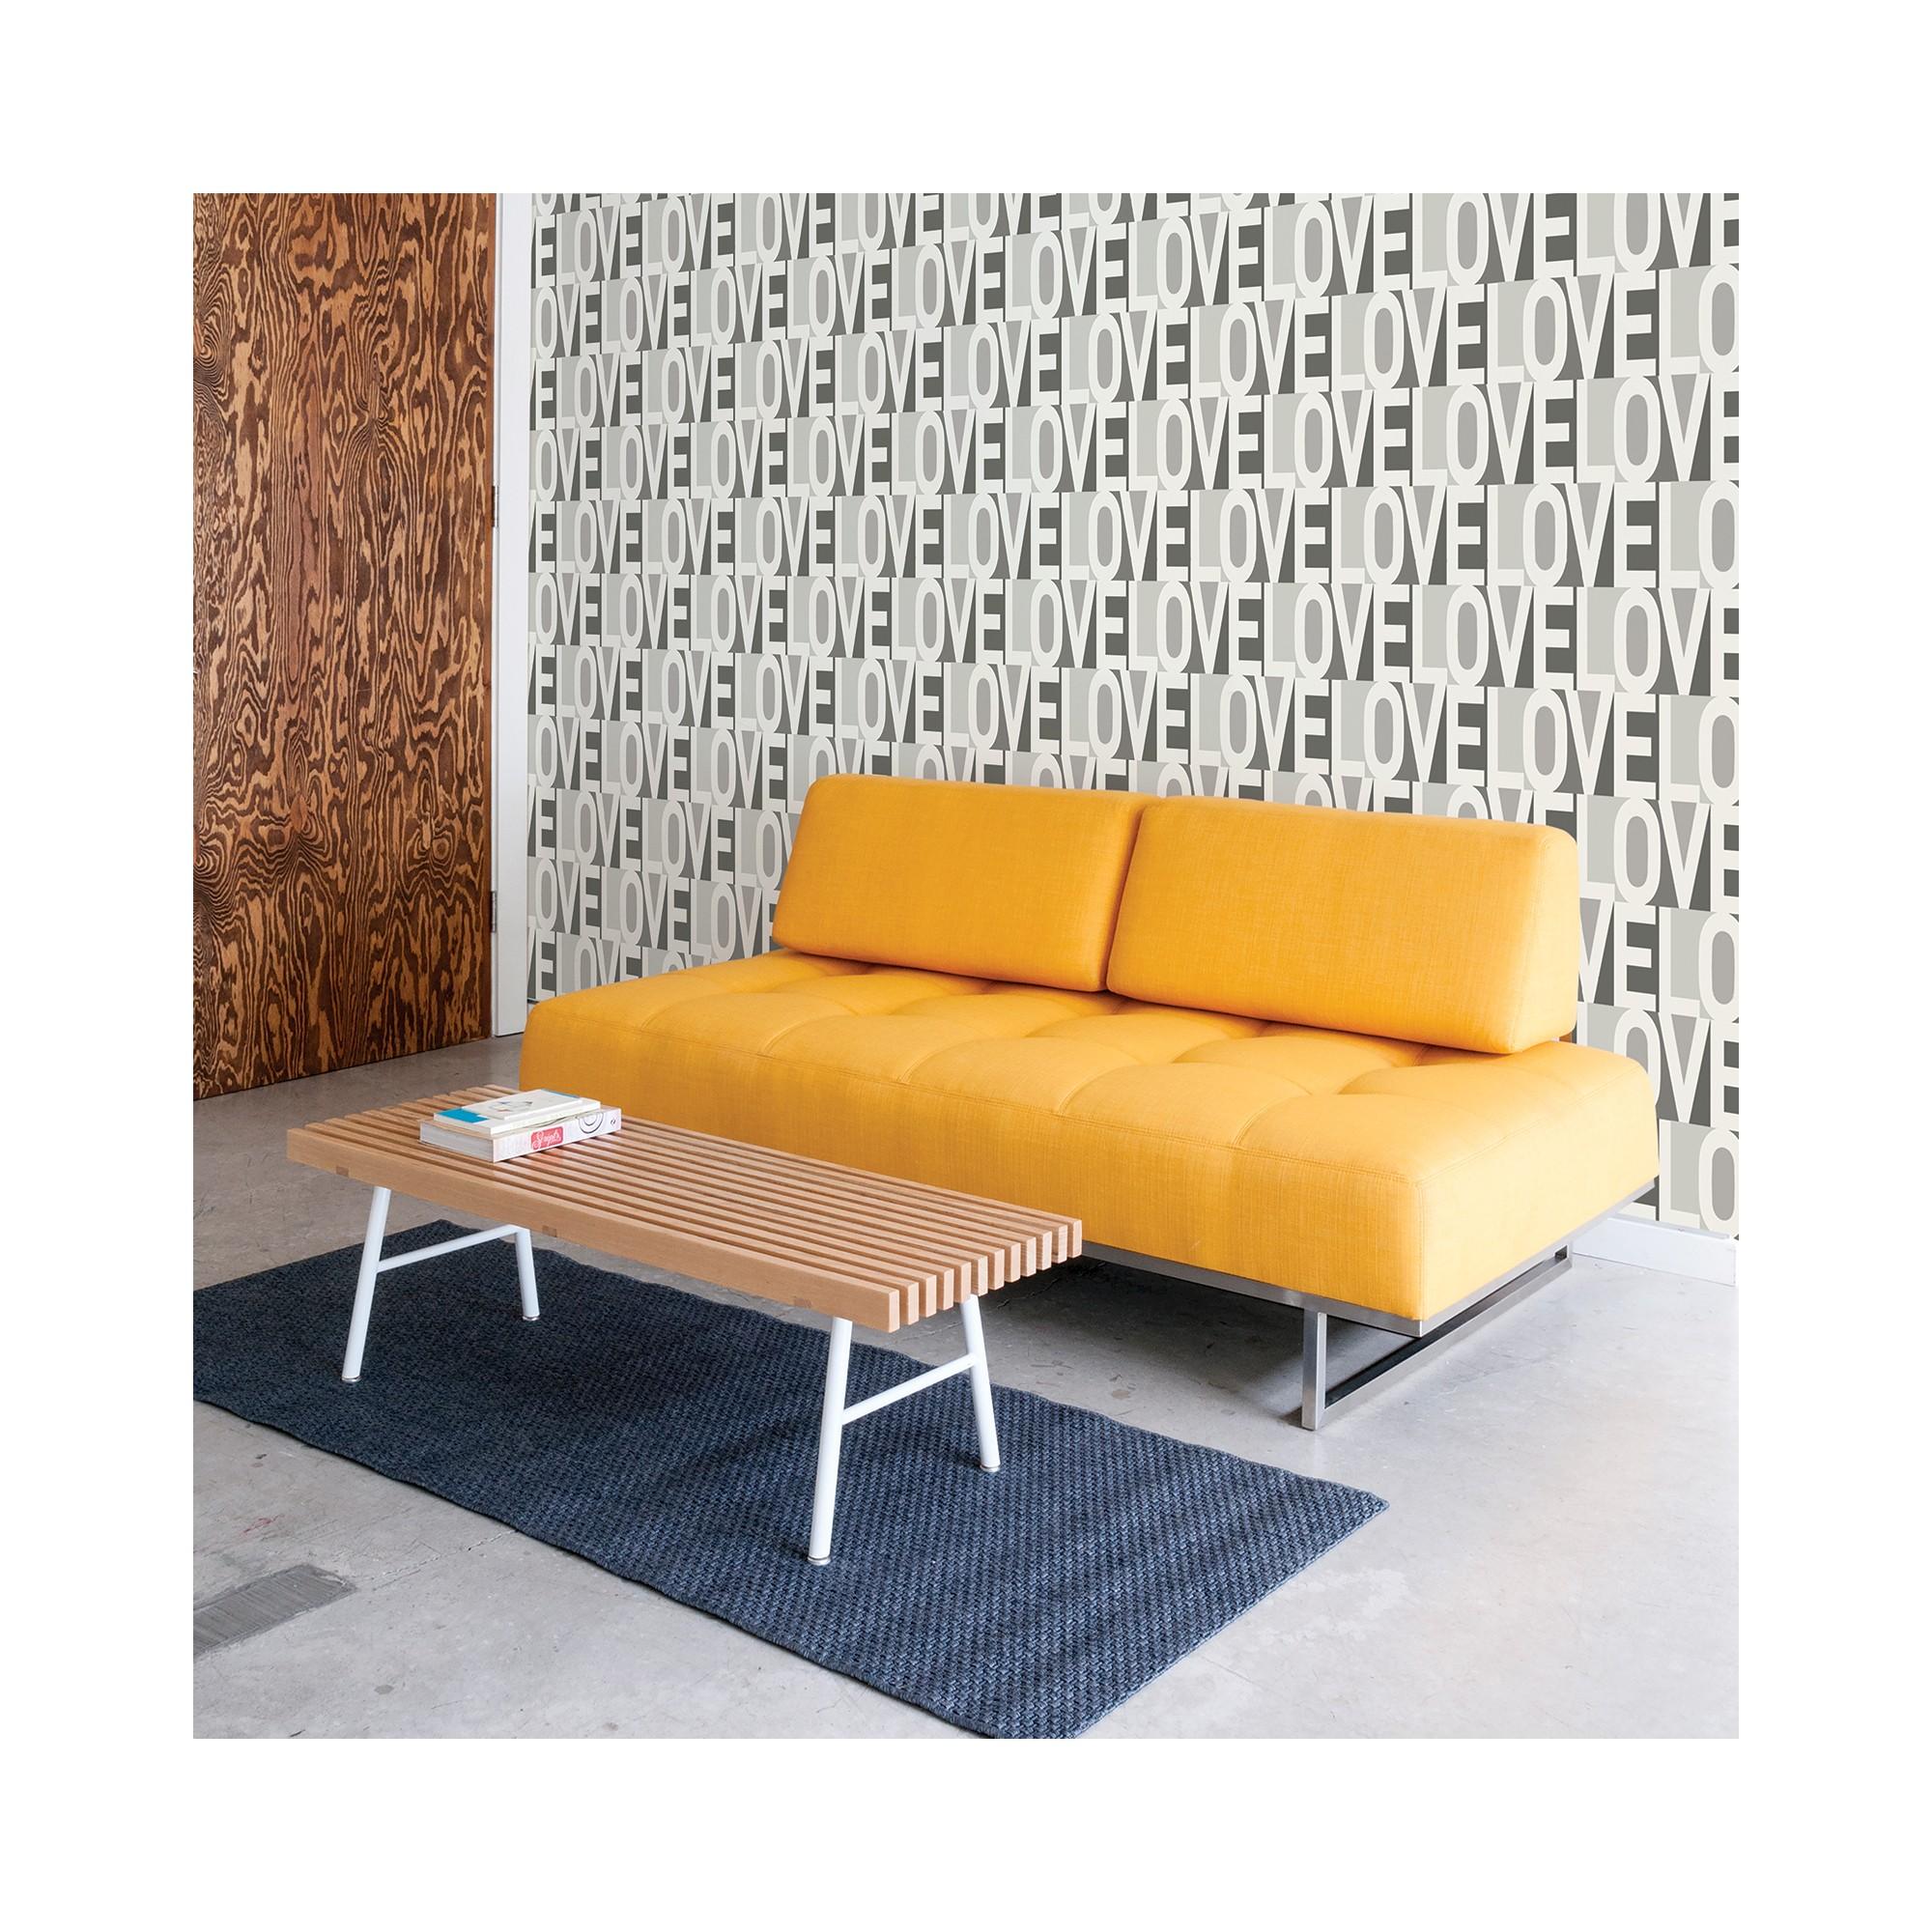 Tempaper SelfAdhesive Removable Wallpaper Love